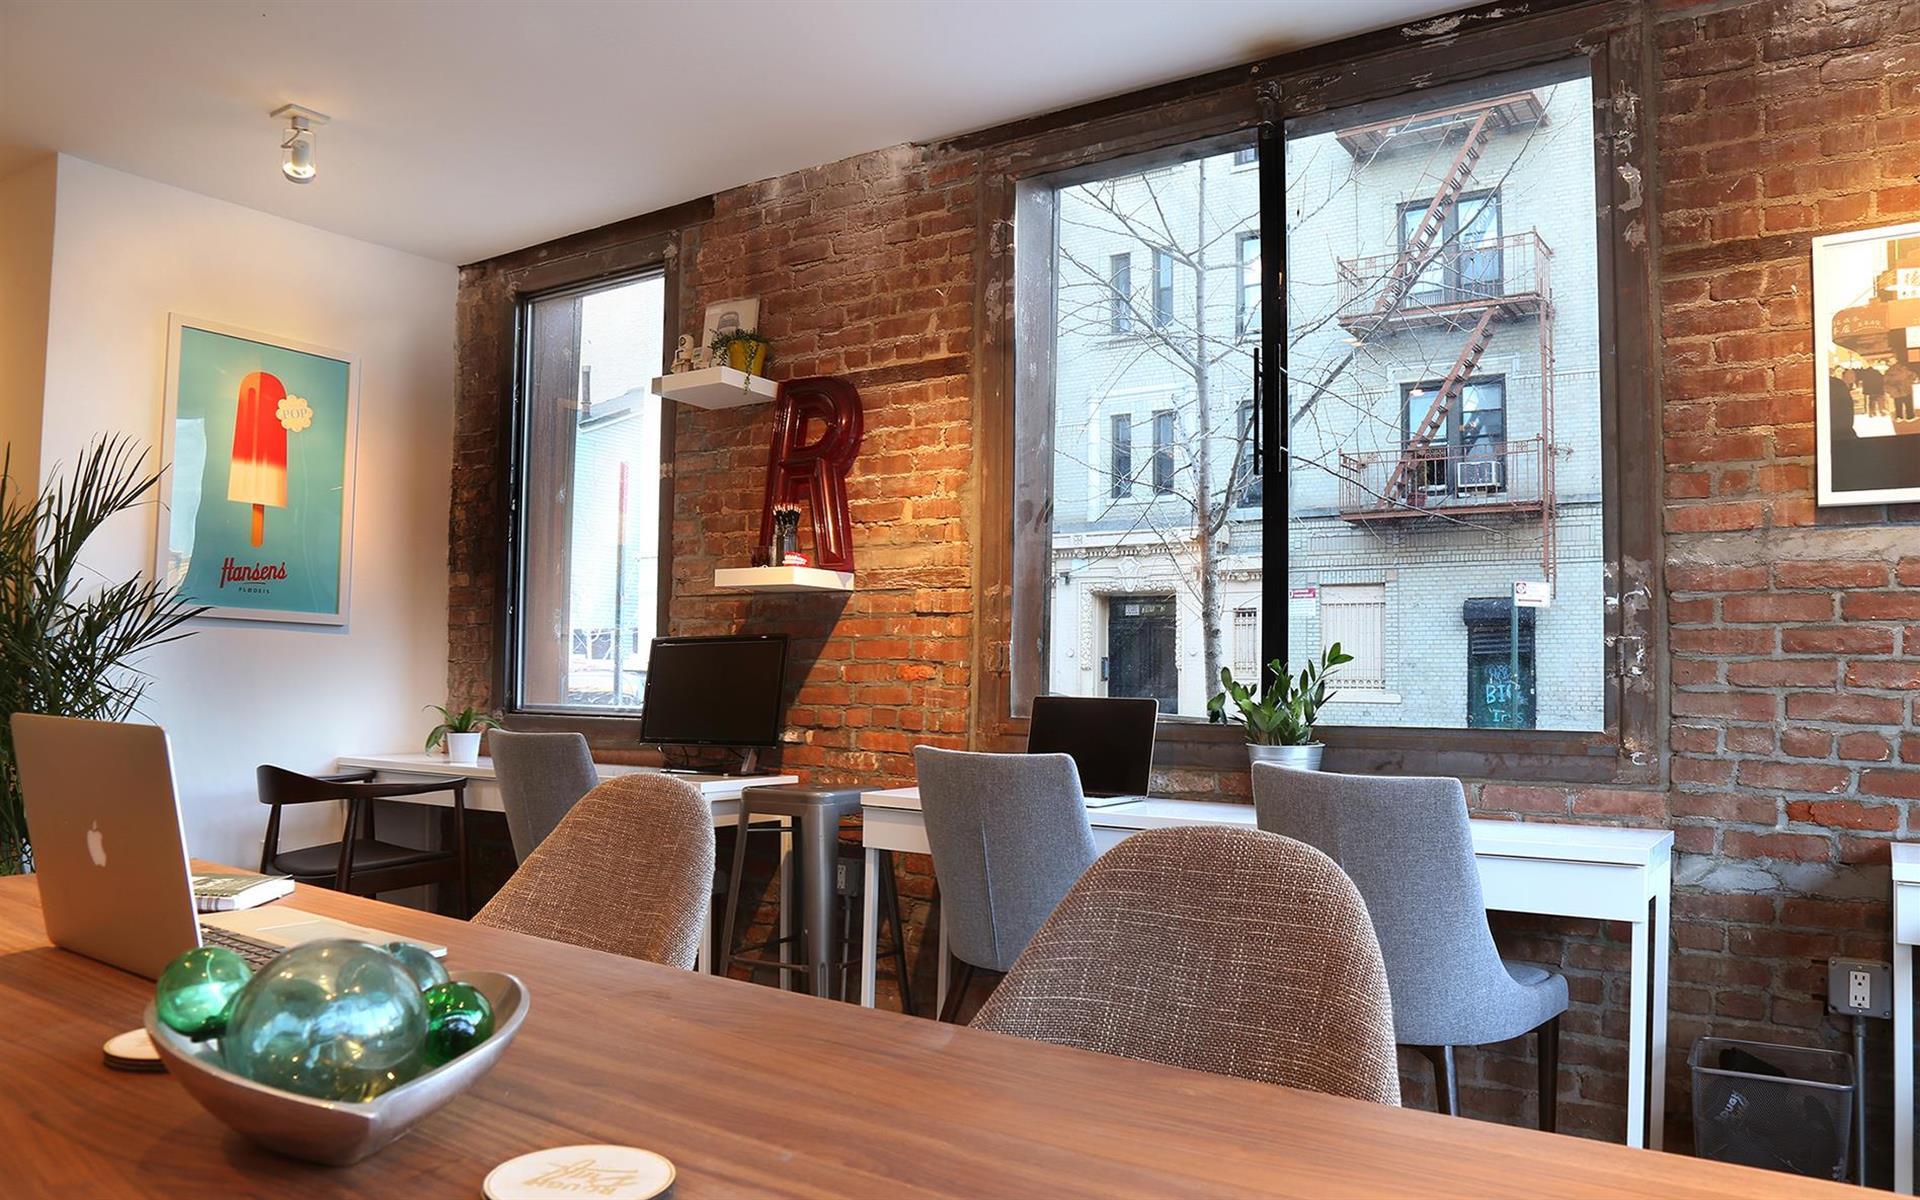 Rough Draft NYC - Brooklyn - Creative Coworking Space in Williamsburg